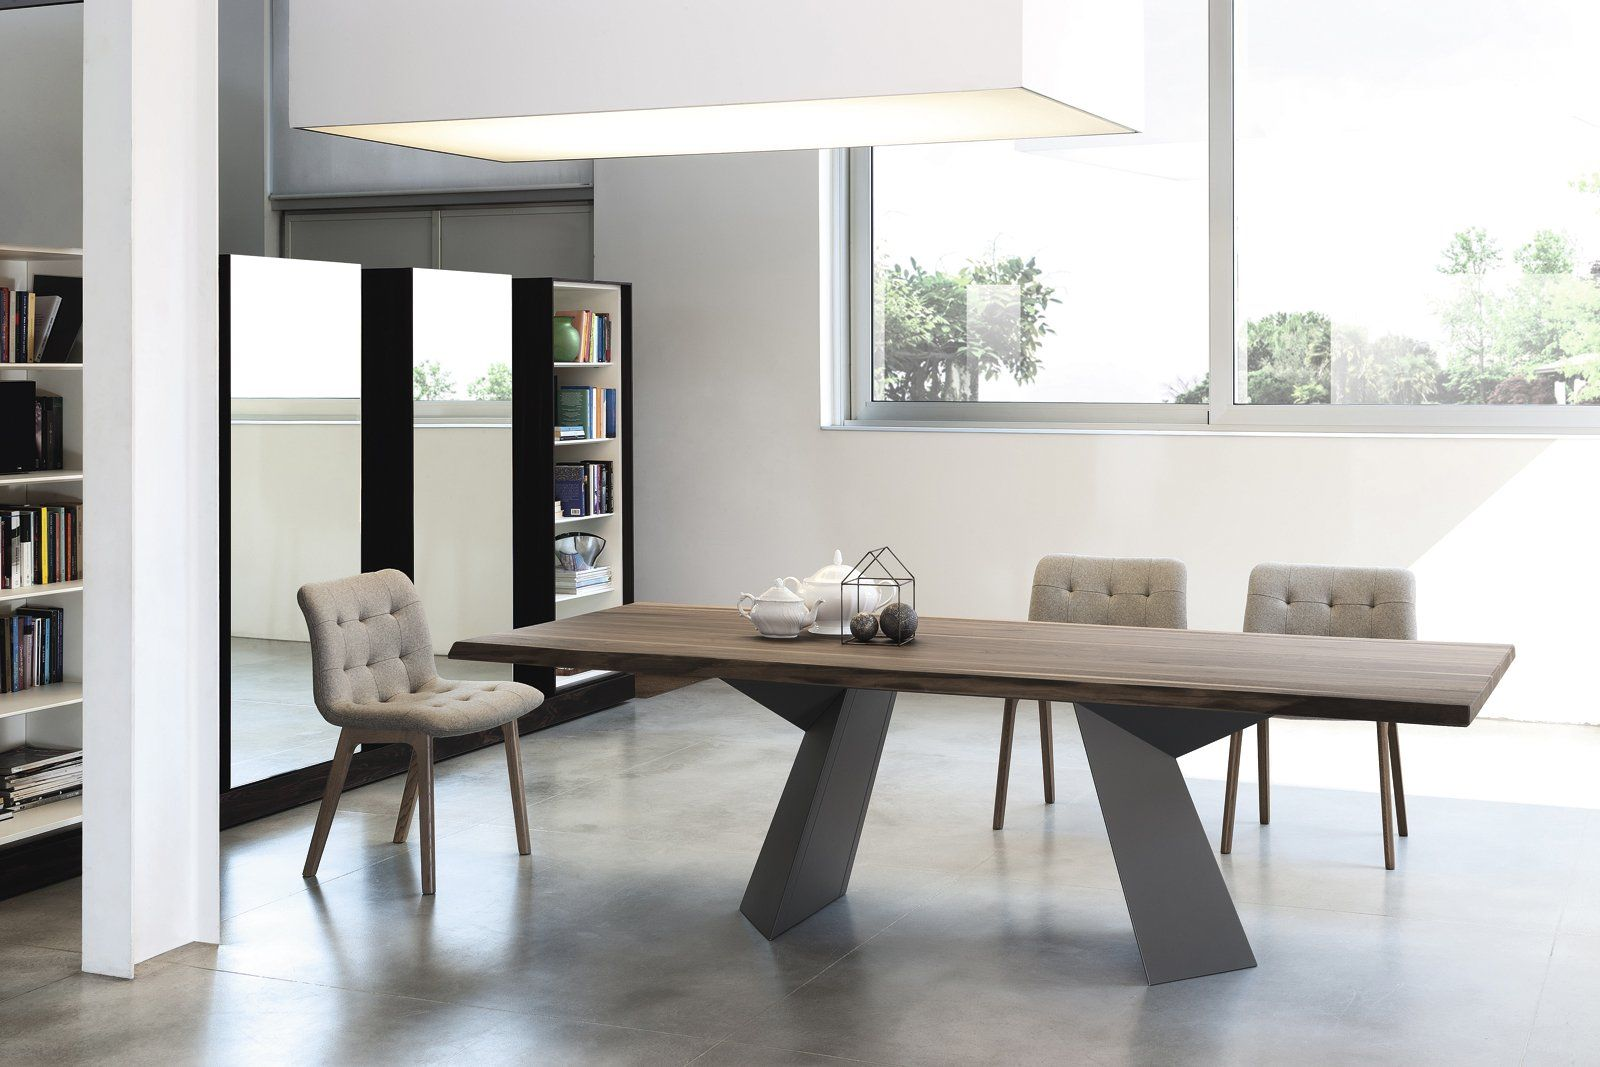 Tavoli Da Pranzo Quadrati : Fiandre dining table in 2018 e.s pinterest tavolo tavoli and